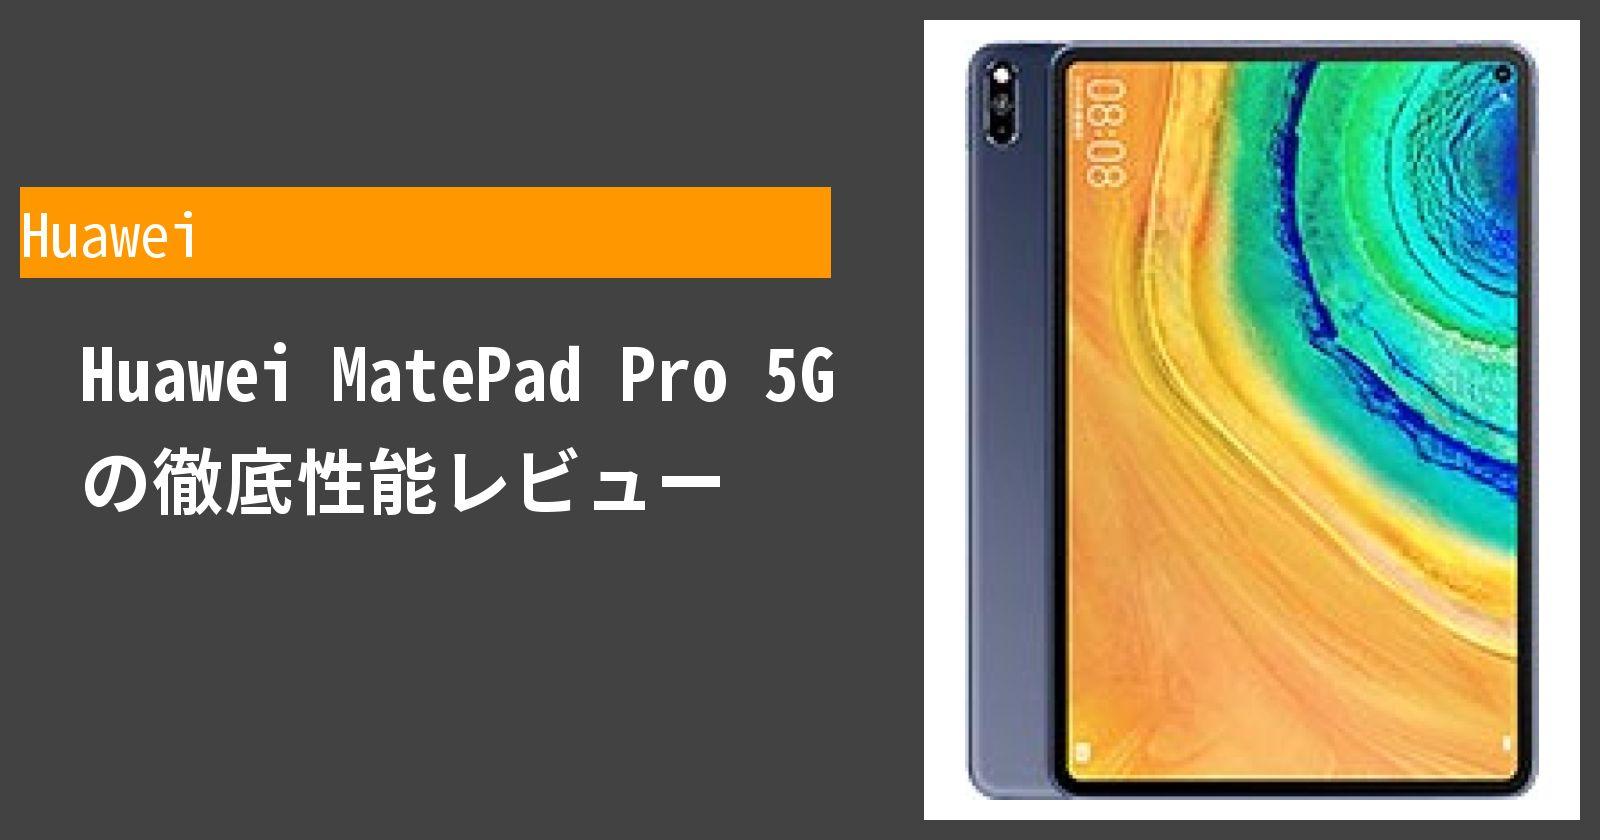 Huawei MatePad Pro 5G の徹底性能レビュー